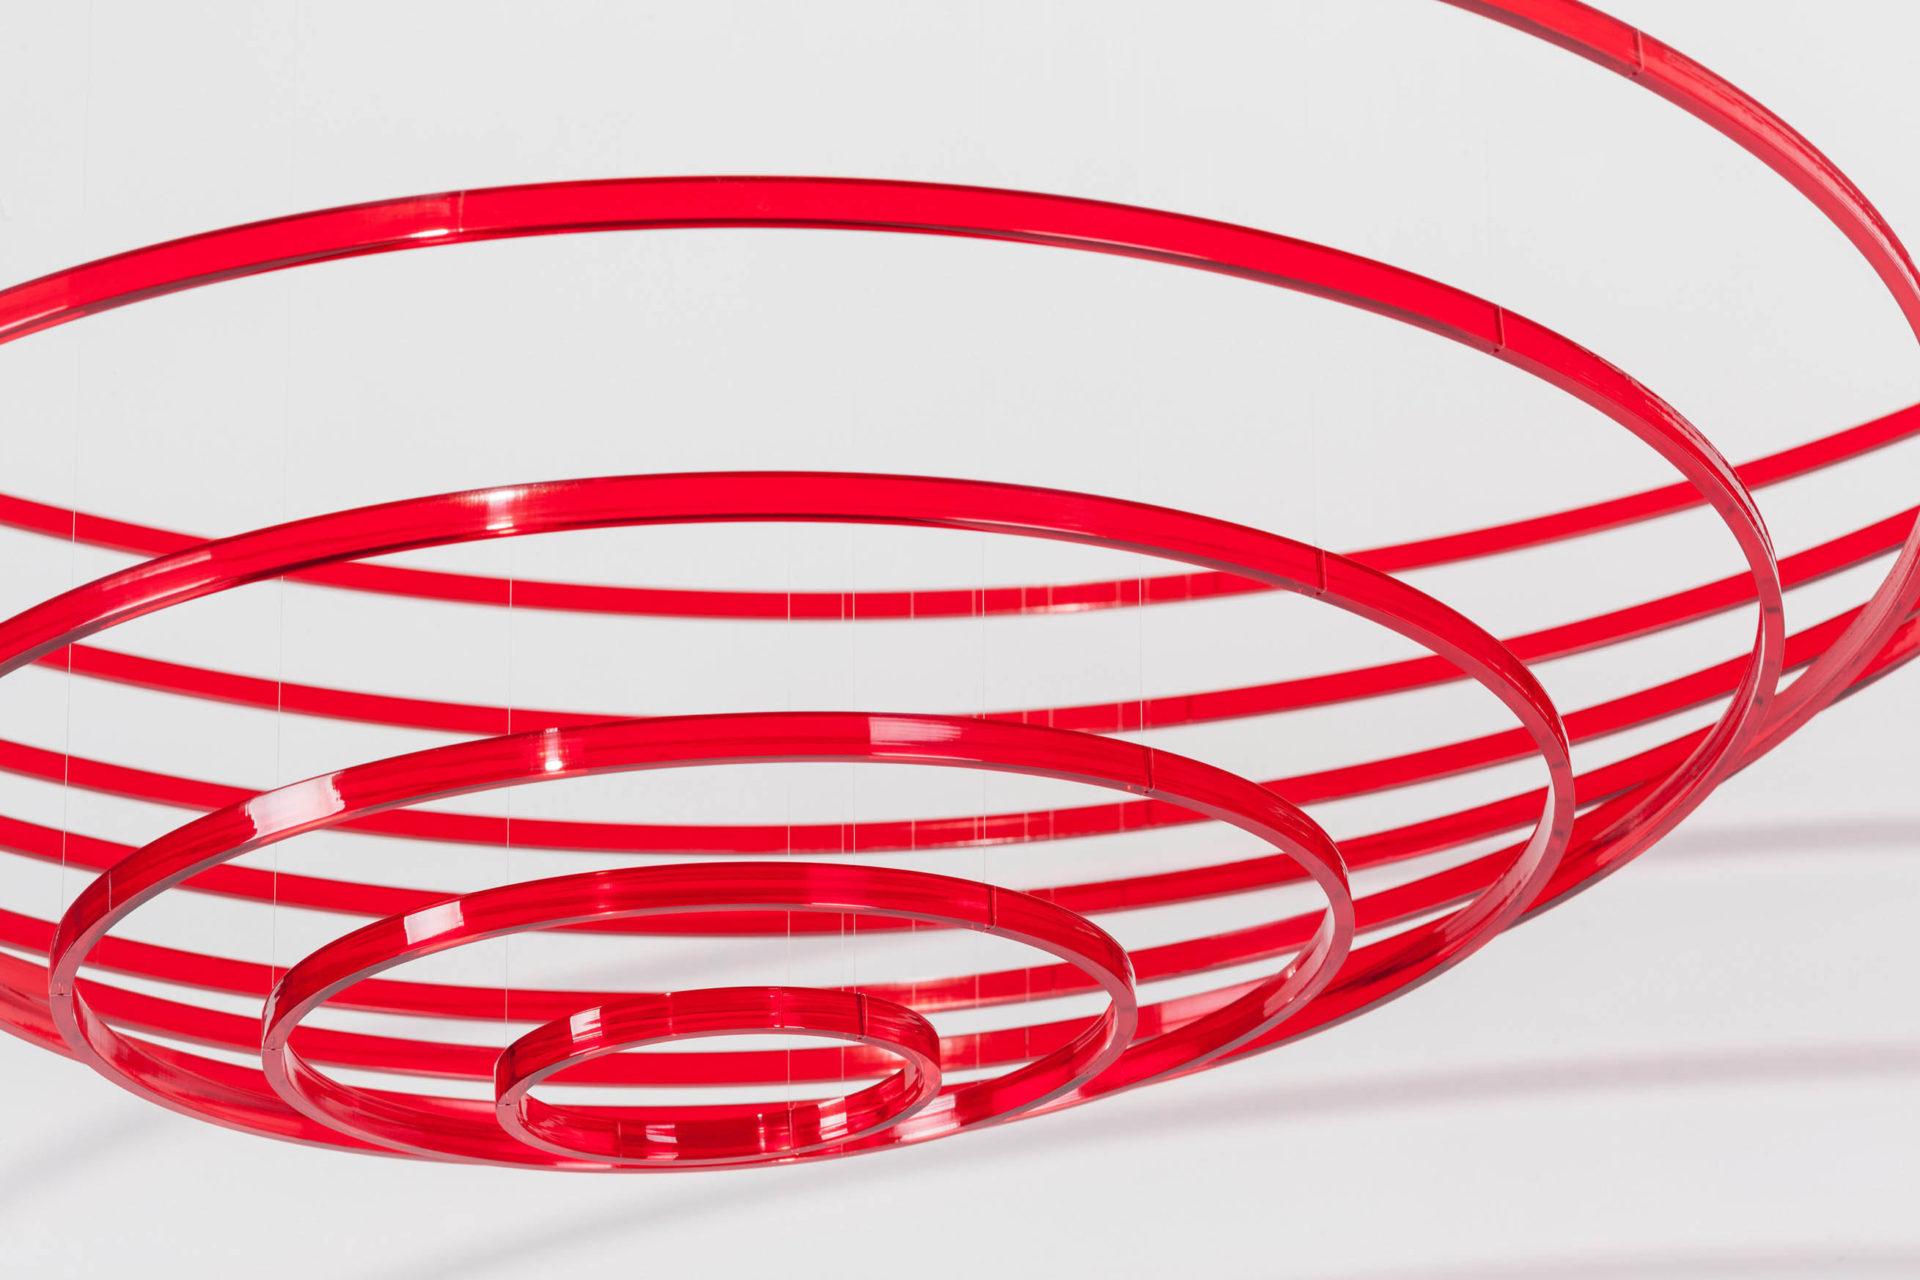 Elias Crespin Circuconcentricos Rojo Transparente